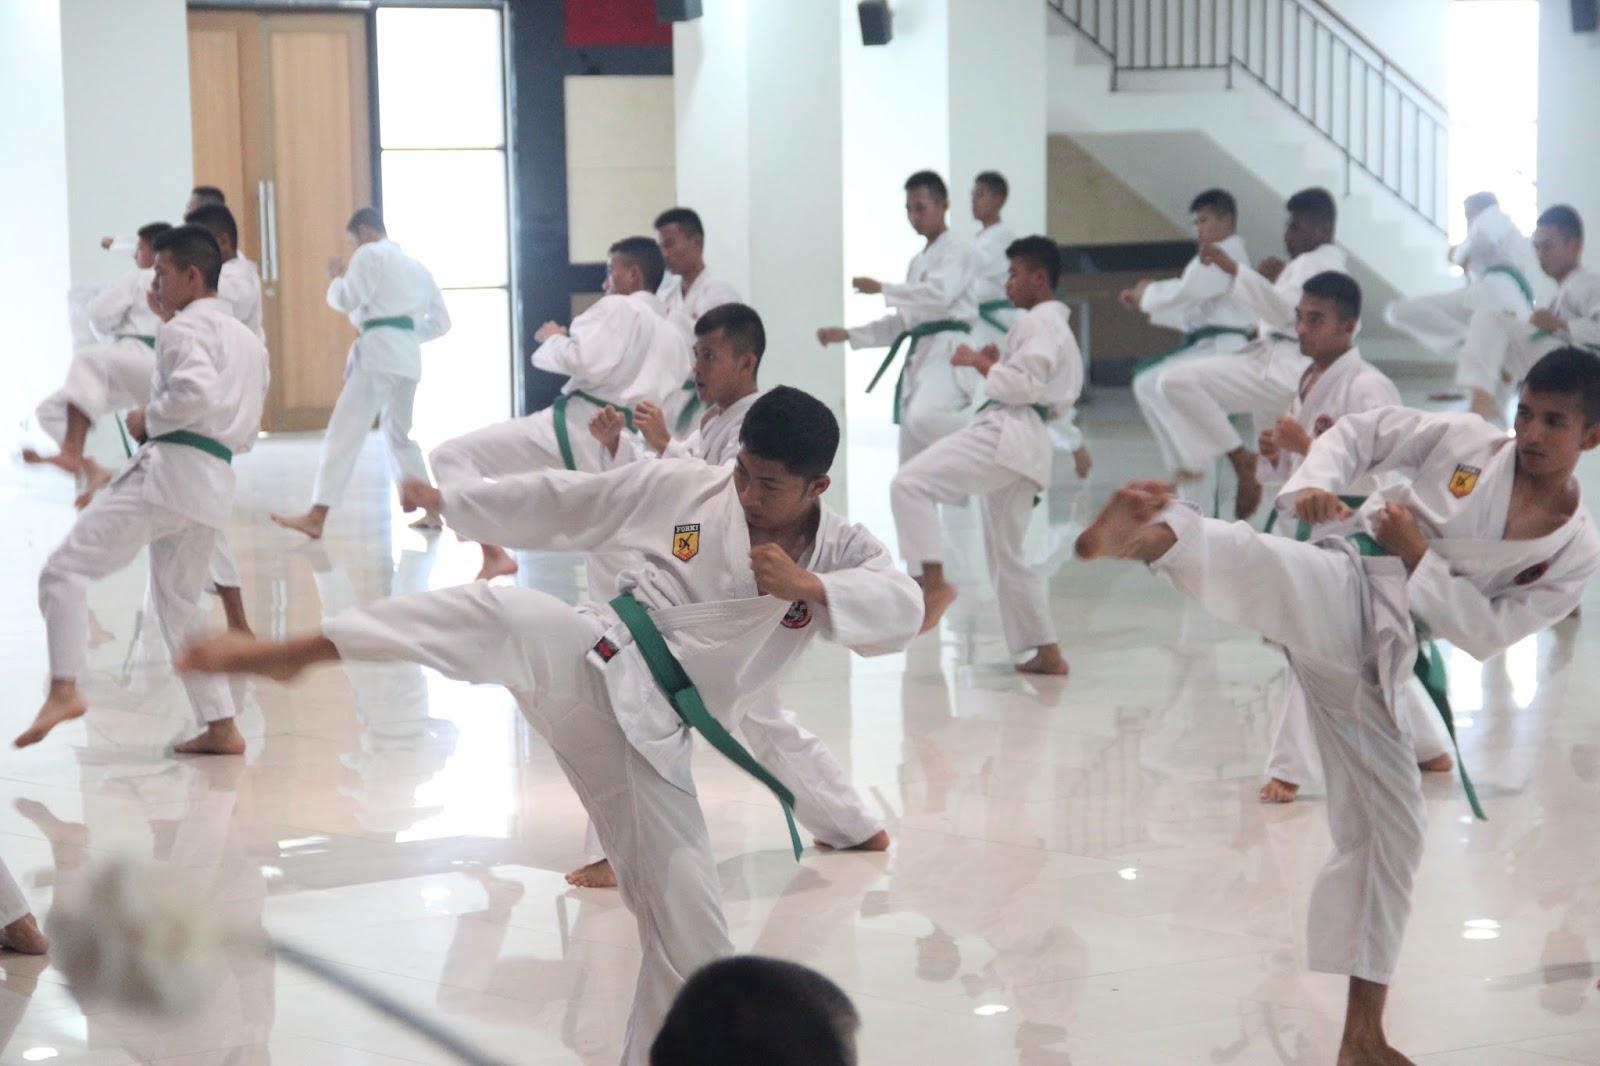 Sabtu, 6 Juni 2015, bertempat di Balairung Dharma Satya IPDN Kampus Sumatera Barat pengurus Karate-Do Sumatera Barat kembali menyelenggarakan ujian karate kenaikan tingkat/sabuk bagi satuan madya praja yang menyandang sabuk kuning dan nindya praja yang  menyandang sabuk hijau. Pelaksanaan ujian diawali dengan